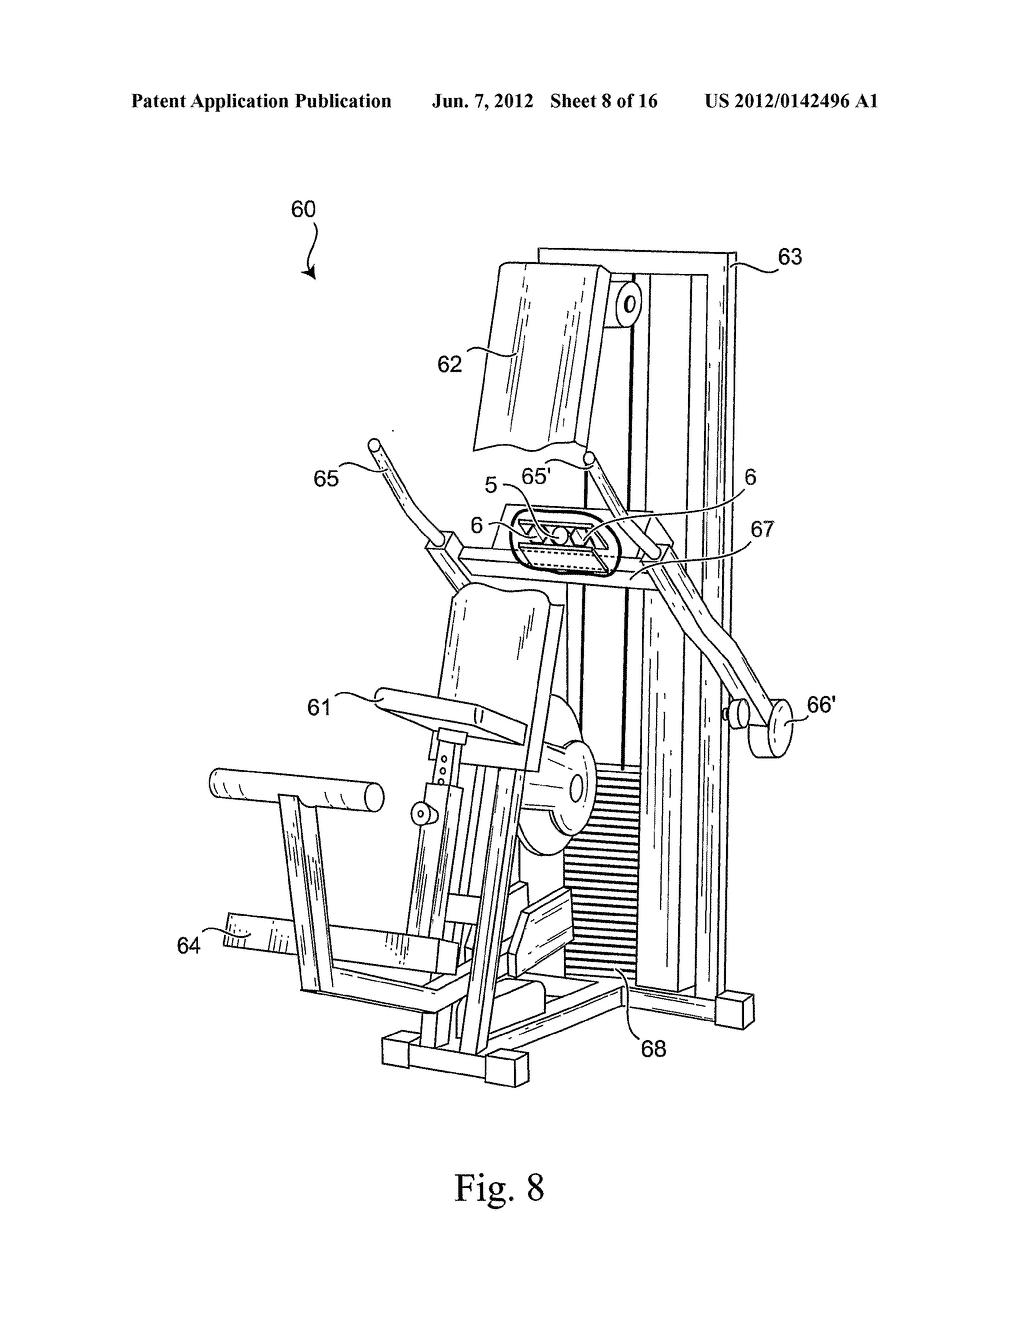 Heathkit Microphone Wiring Diagram Icom Microphone Wiring